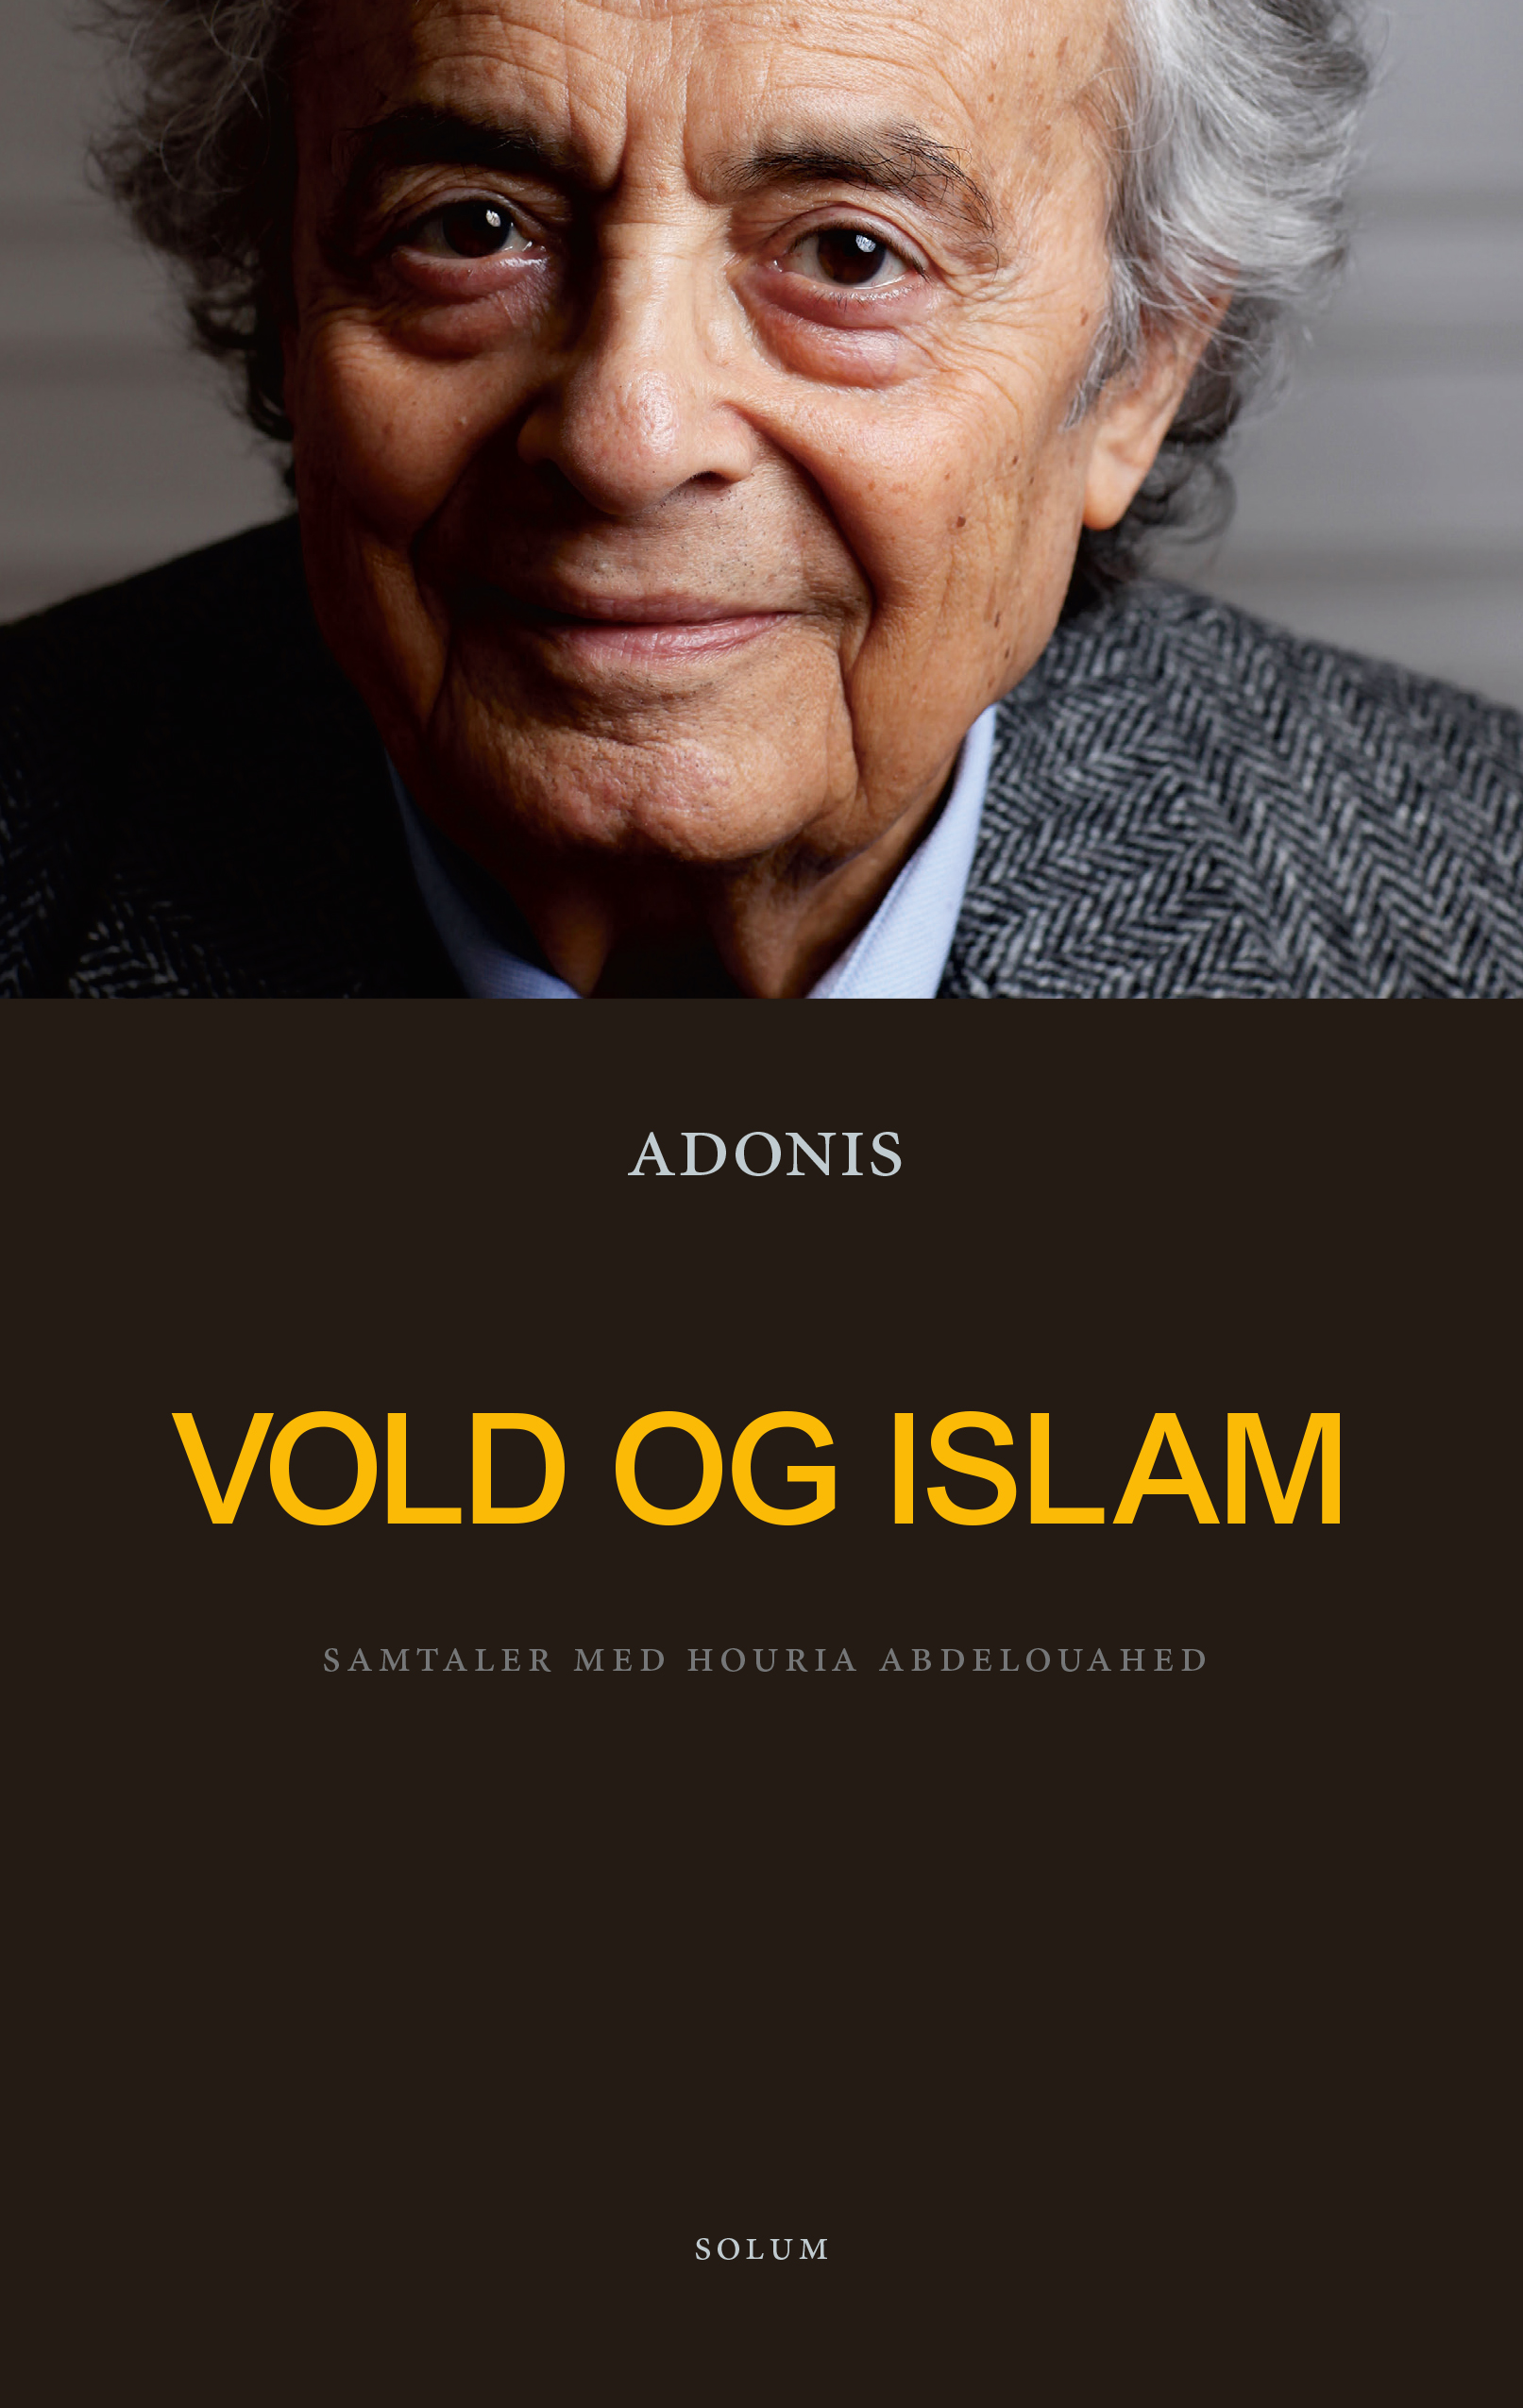 Adonis Vold og Islam